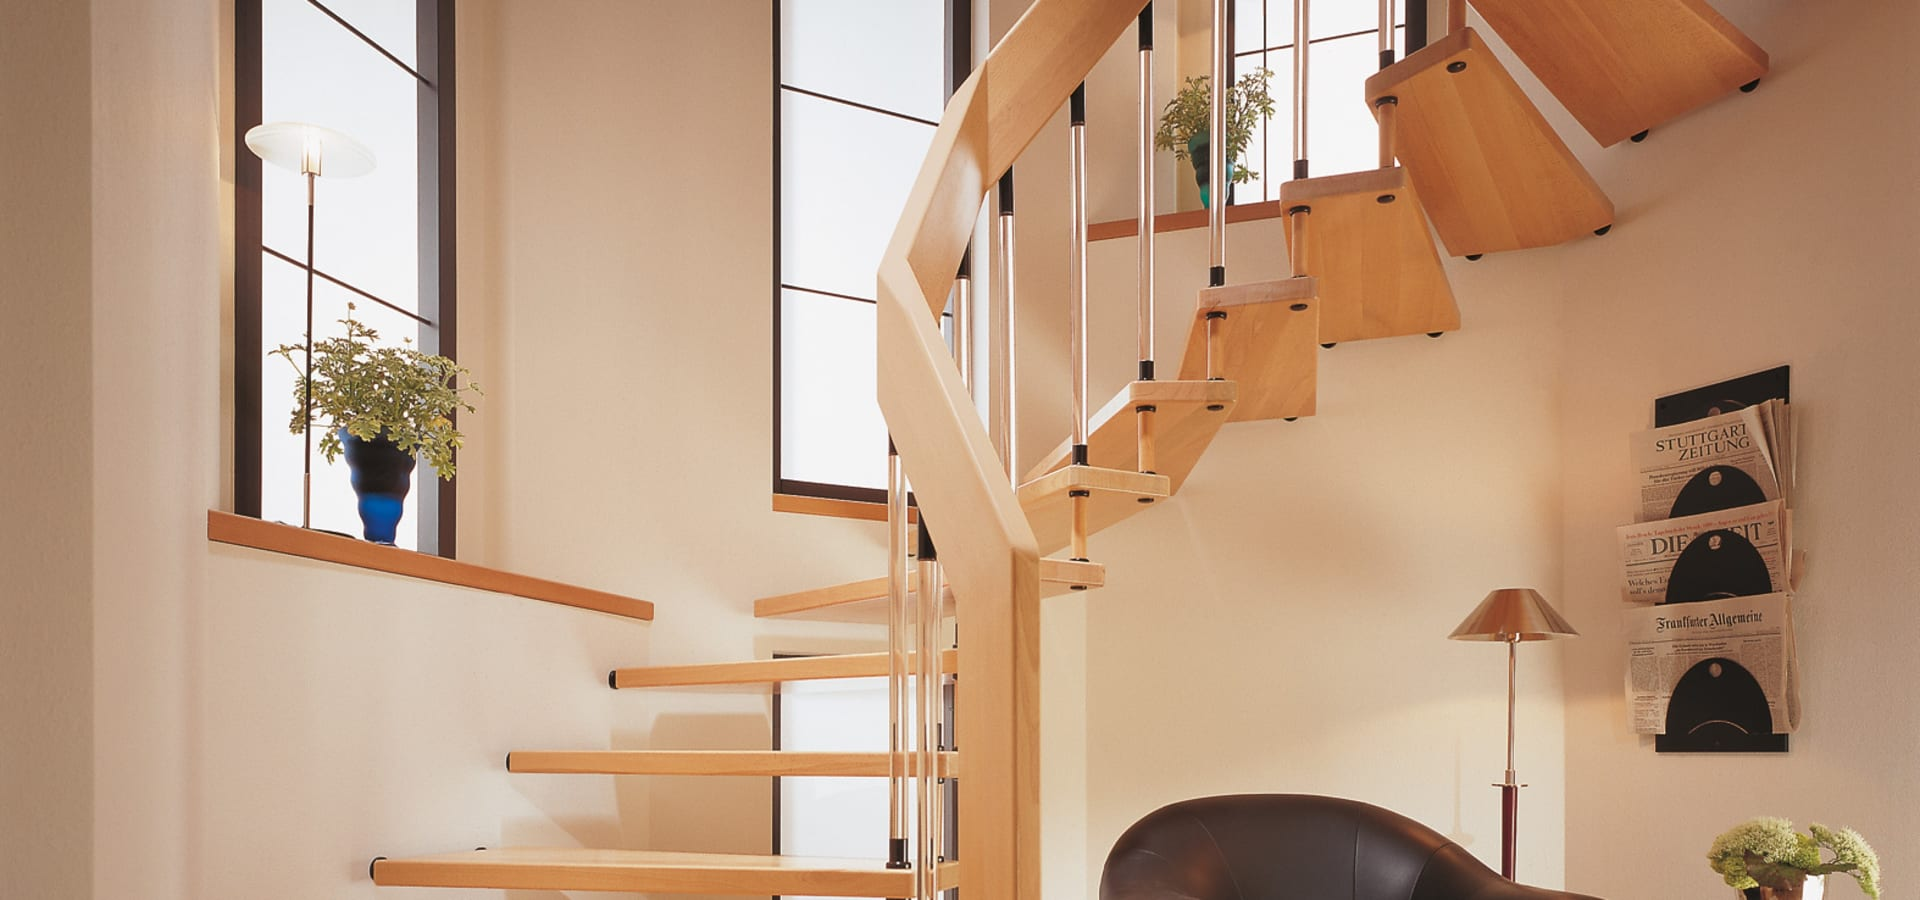 Treppen Bucher bucher treppe by r treppenbau homify